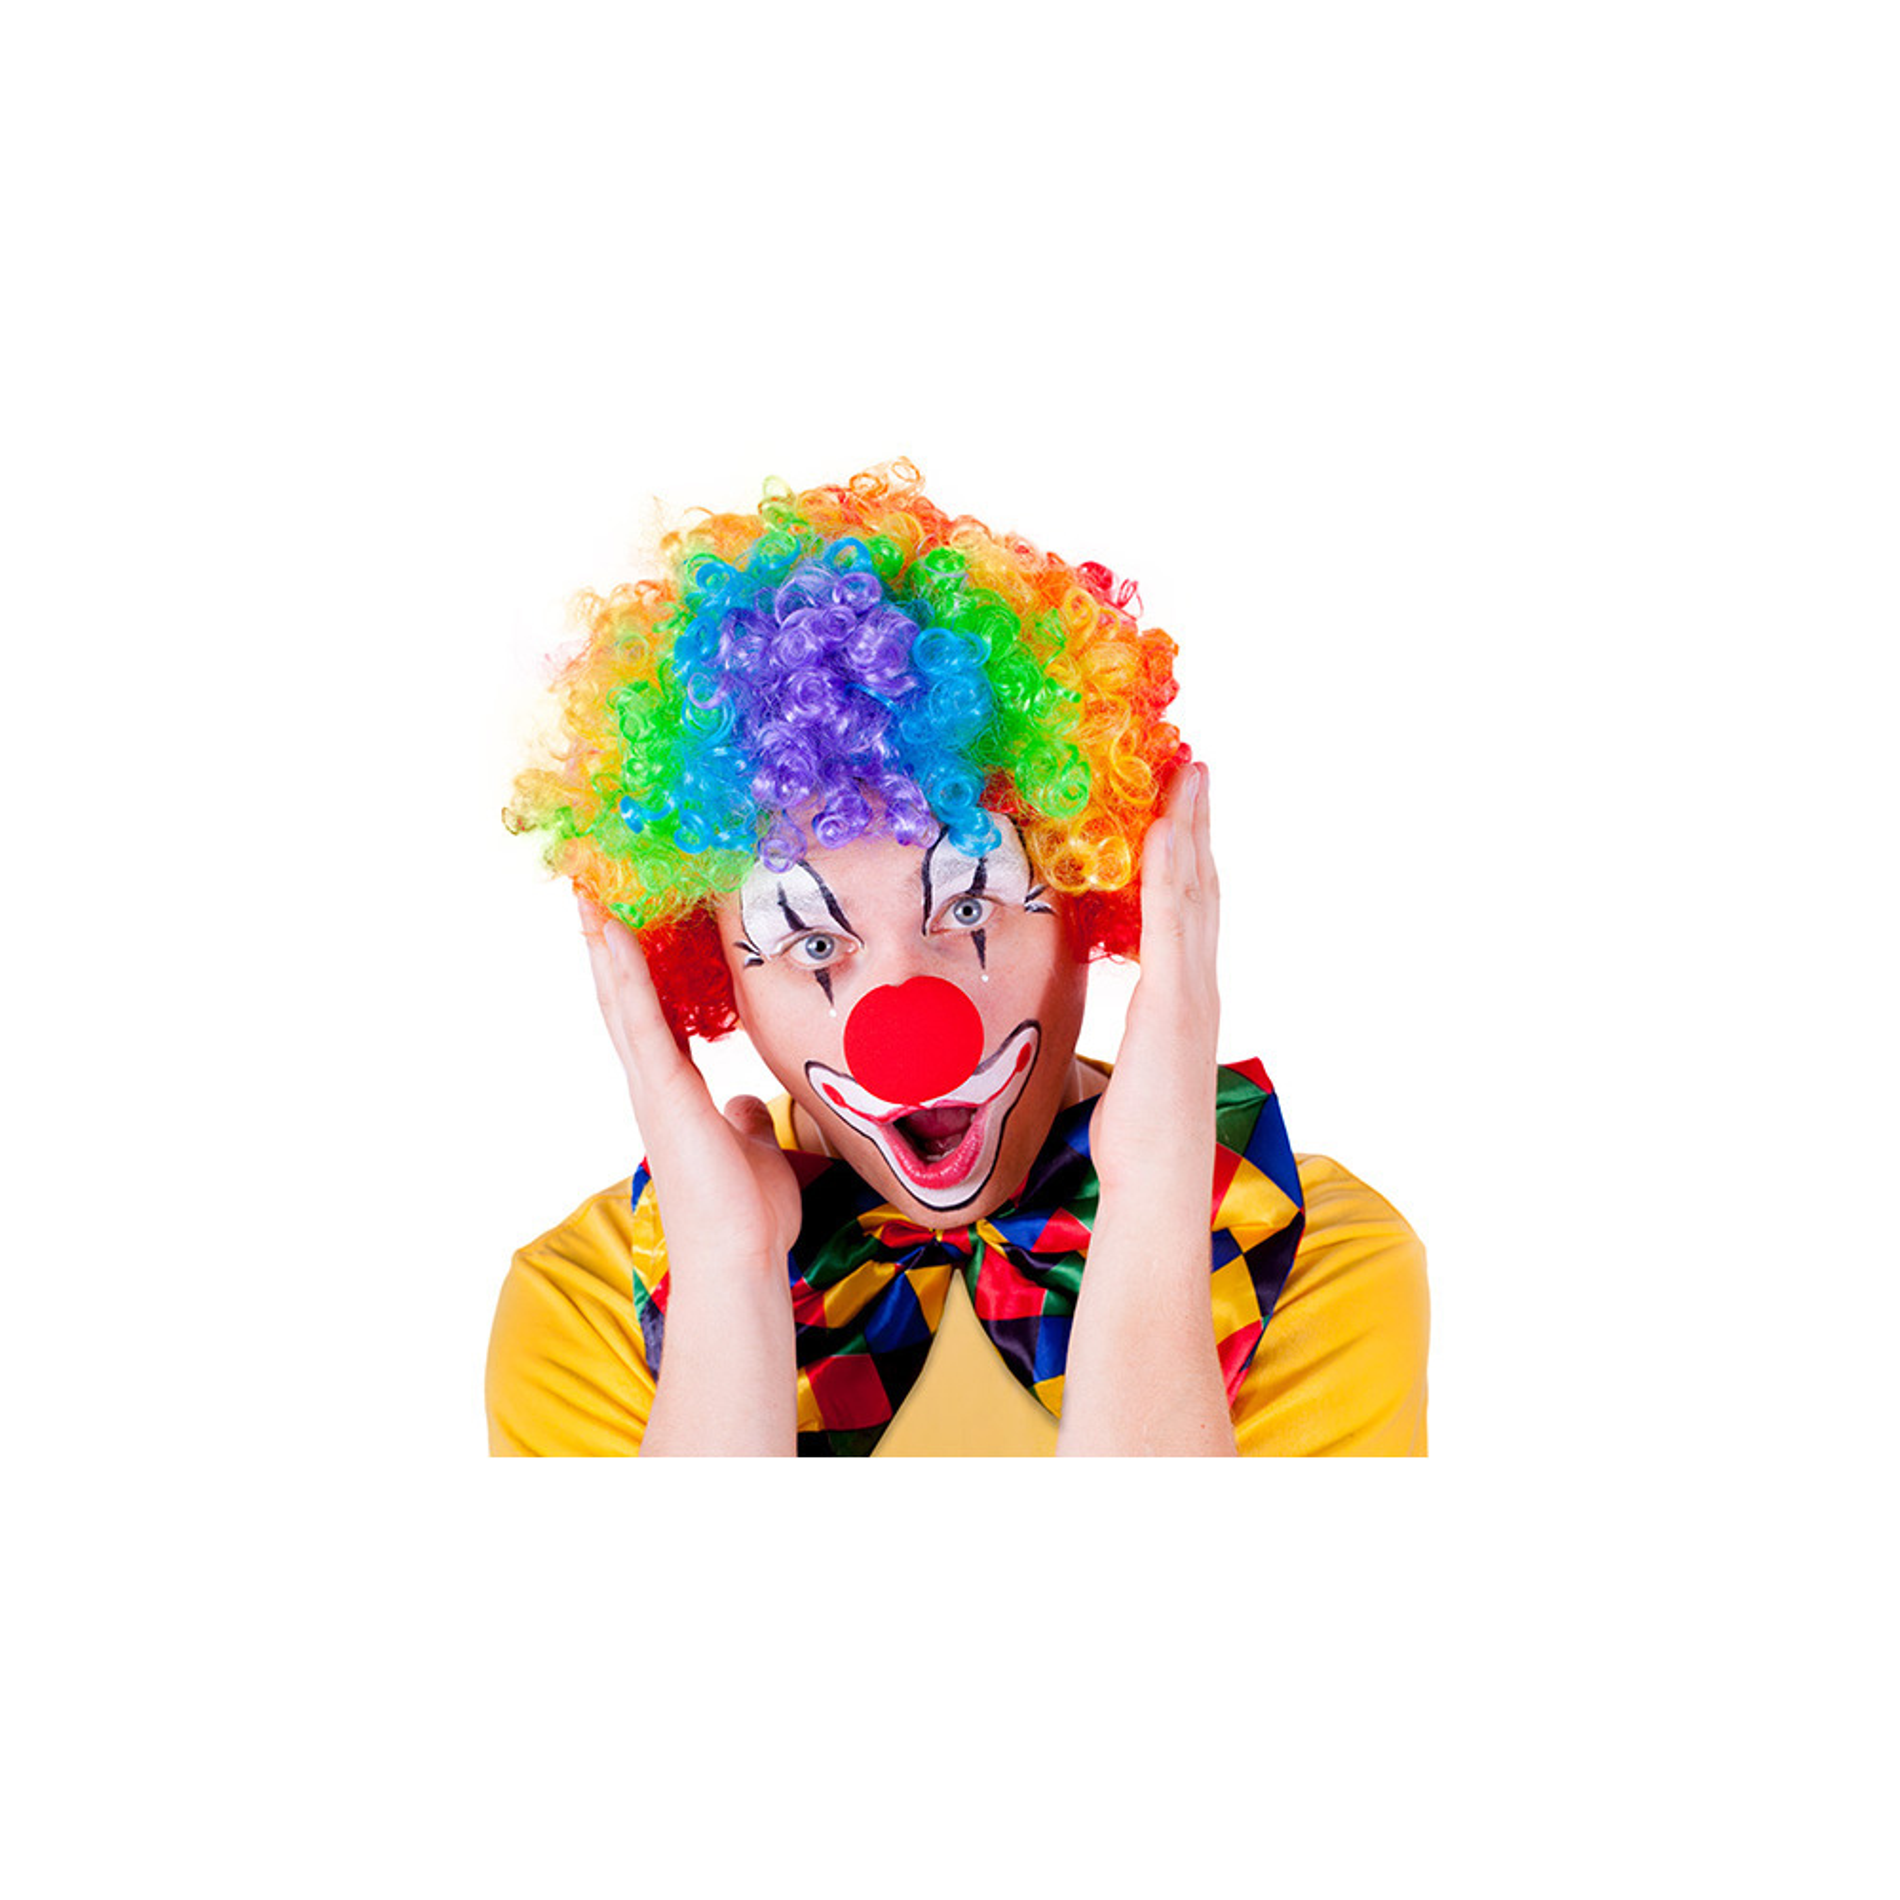 parochňa klaun farebná, dospelá